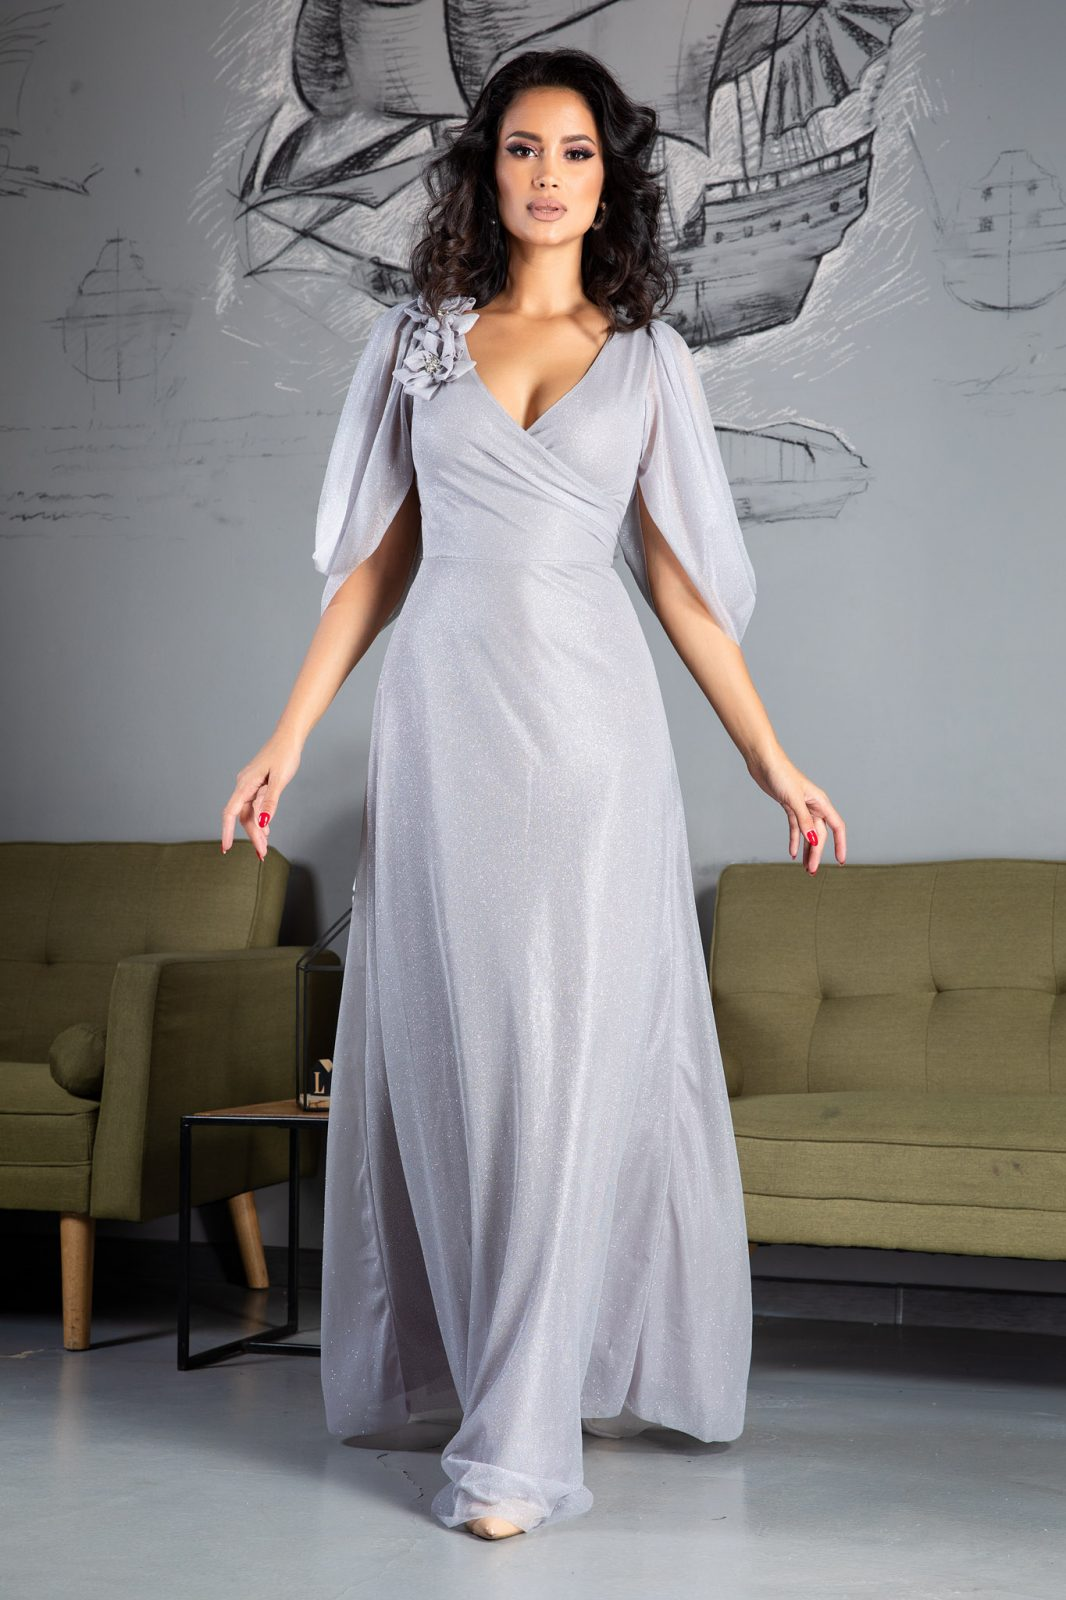 Teresa Maxi Γκρι Φόρεμα 5029 2